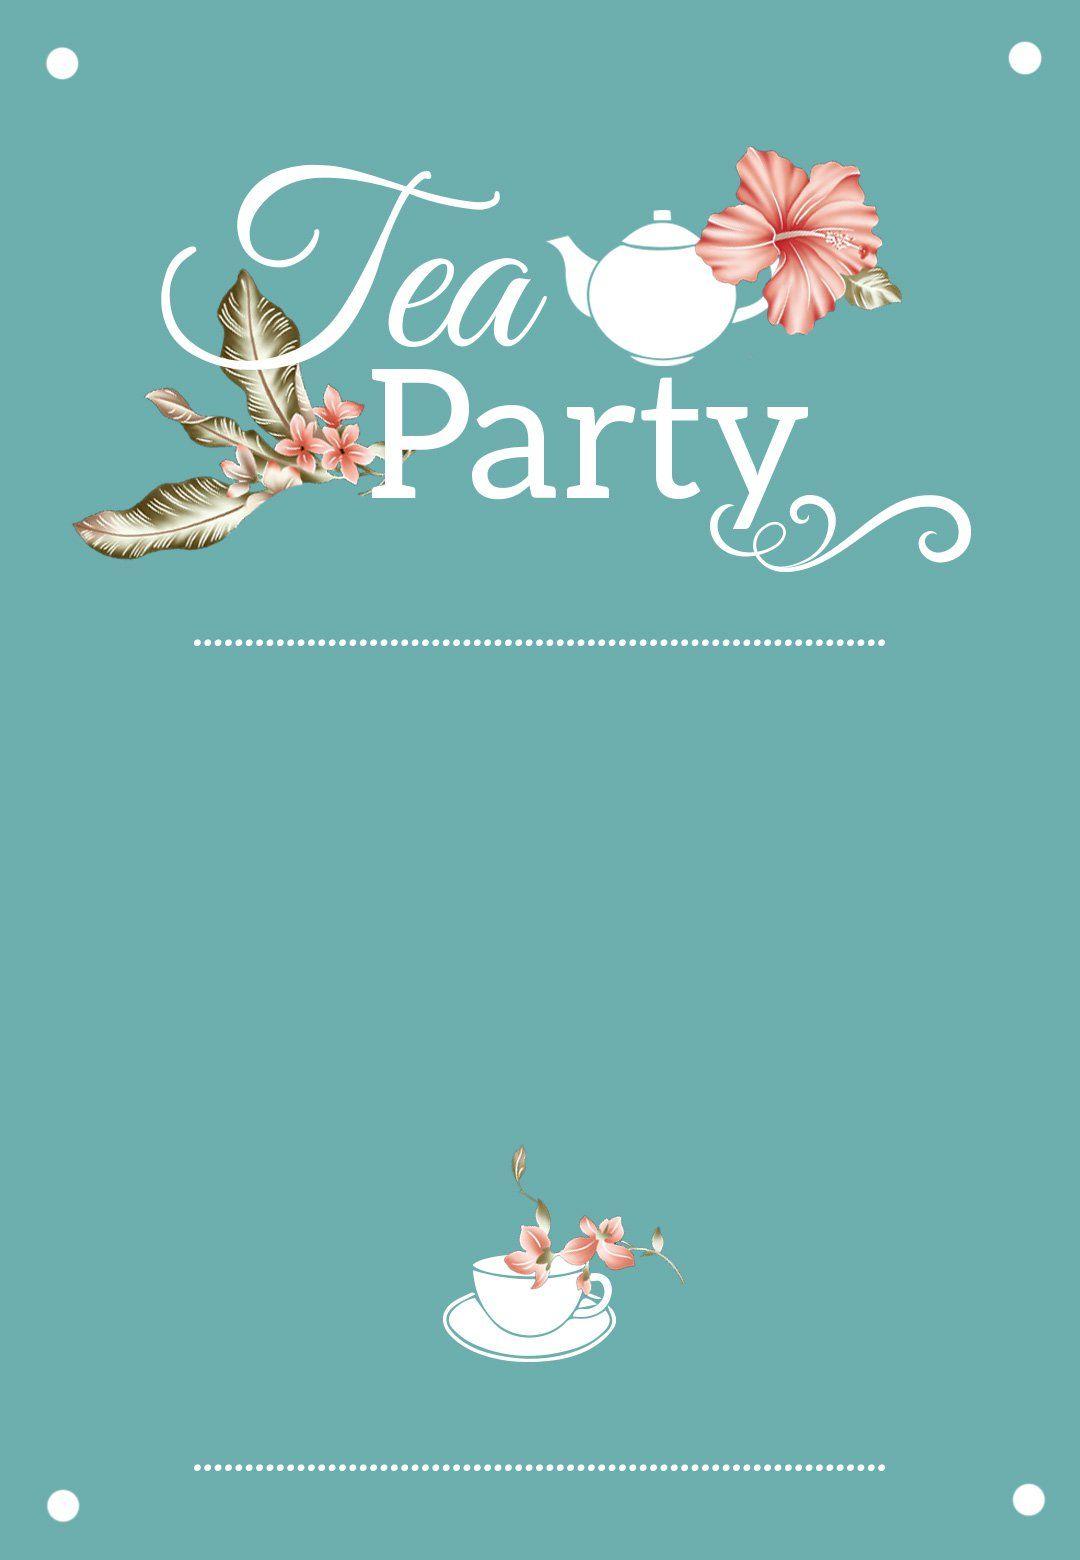 Bridal Shower Tea Party - Free Bridal Shower Invitation Template ...